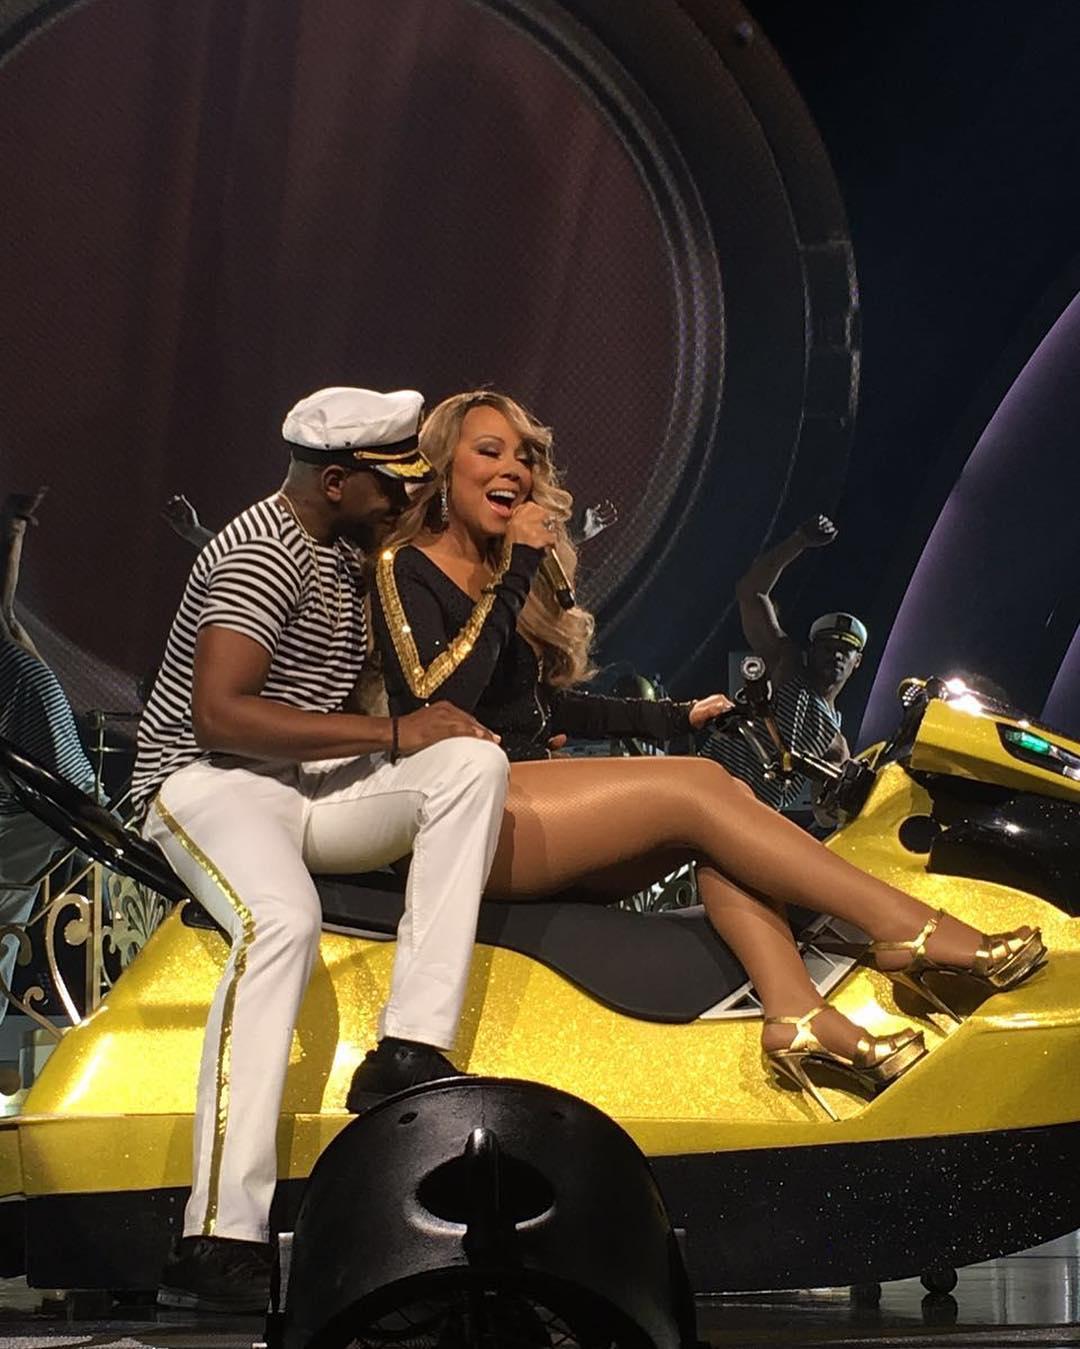 Mariah en résidence à Las Vegas - Page 4 12633662_1064126953619452_598611442361315626_o